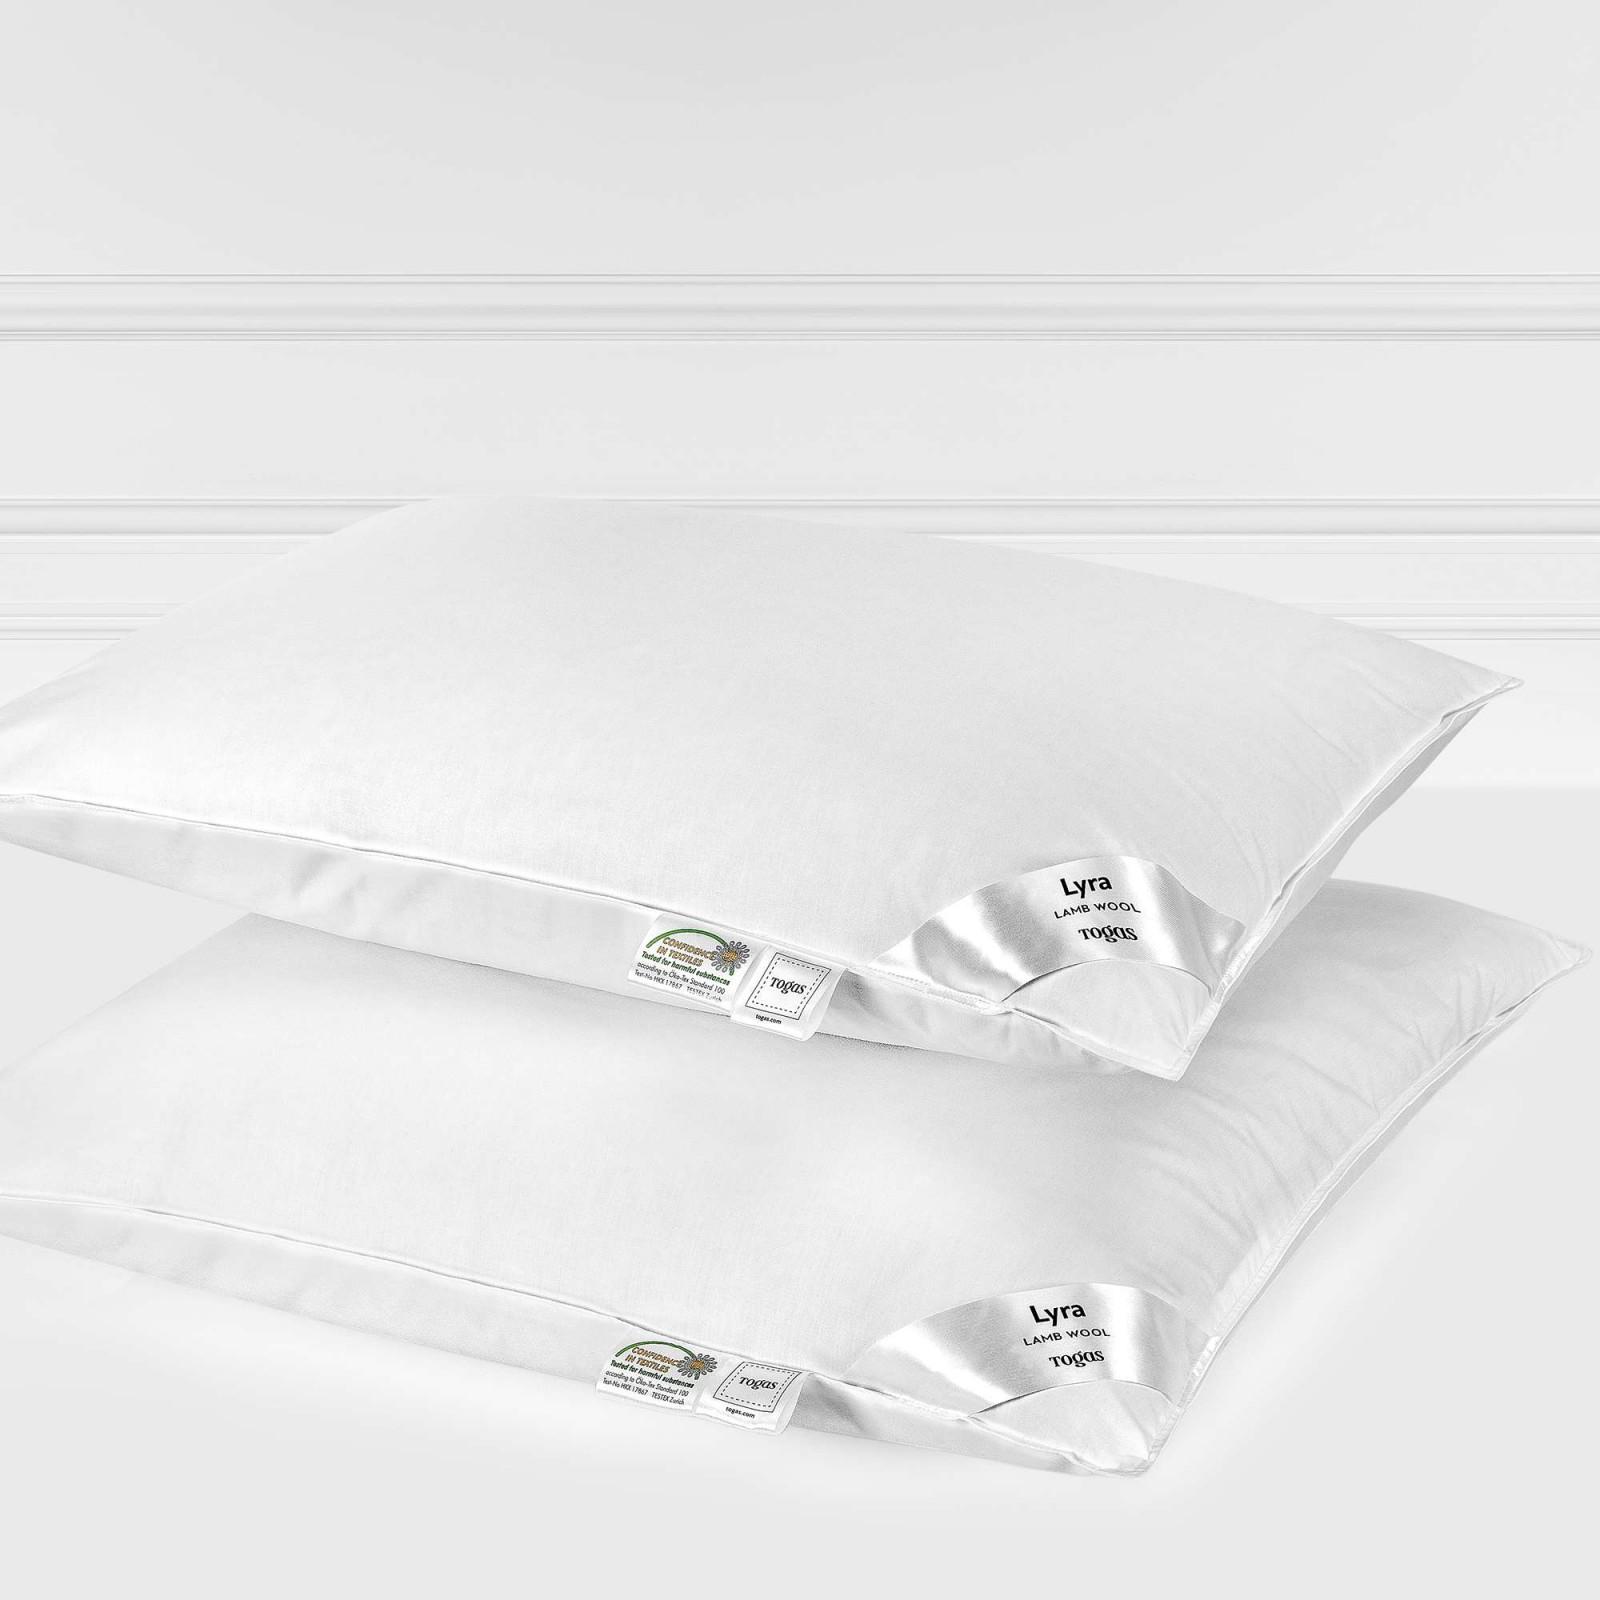 Подушки Togas Подушка Лира (50х70) подушки ортопедические togas подушка ортопедическая германиум